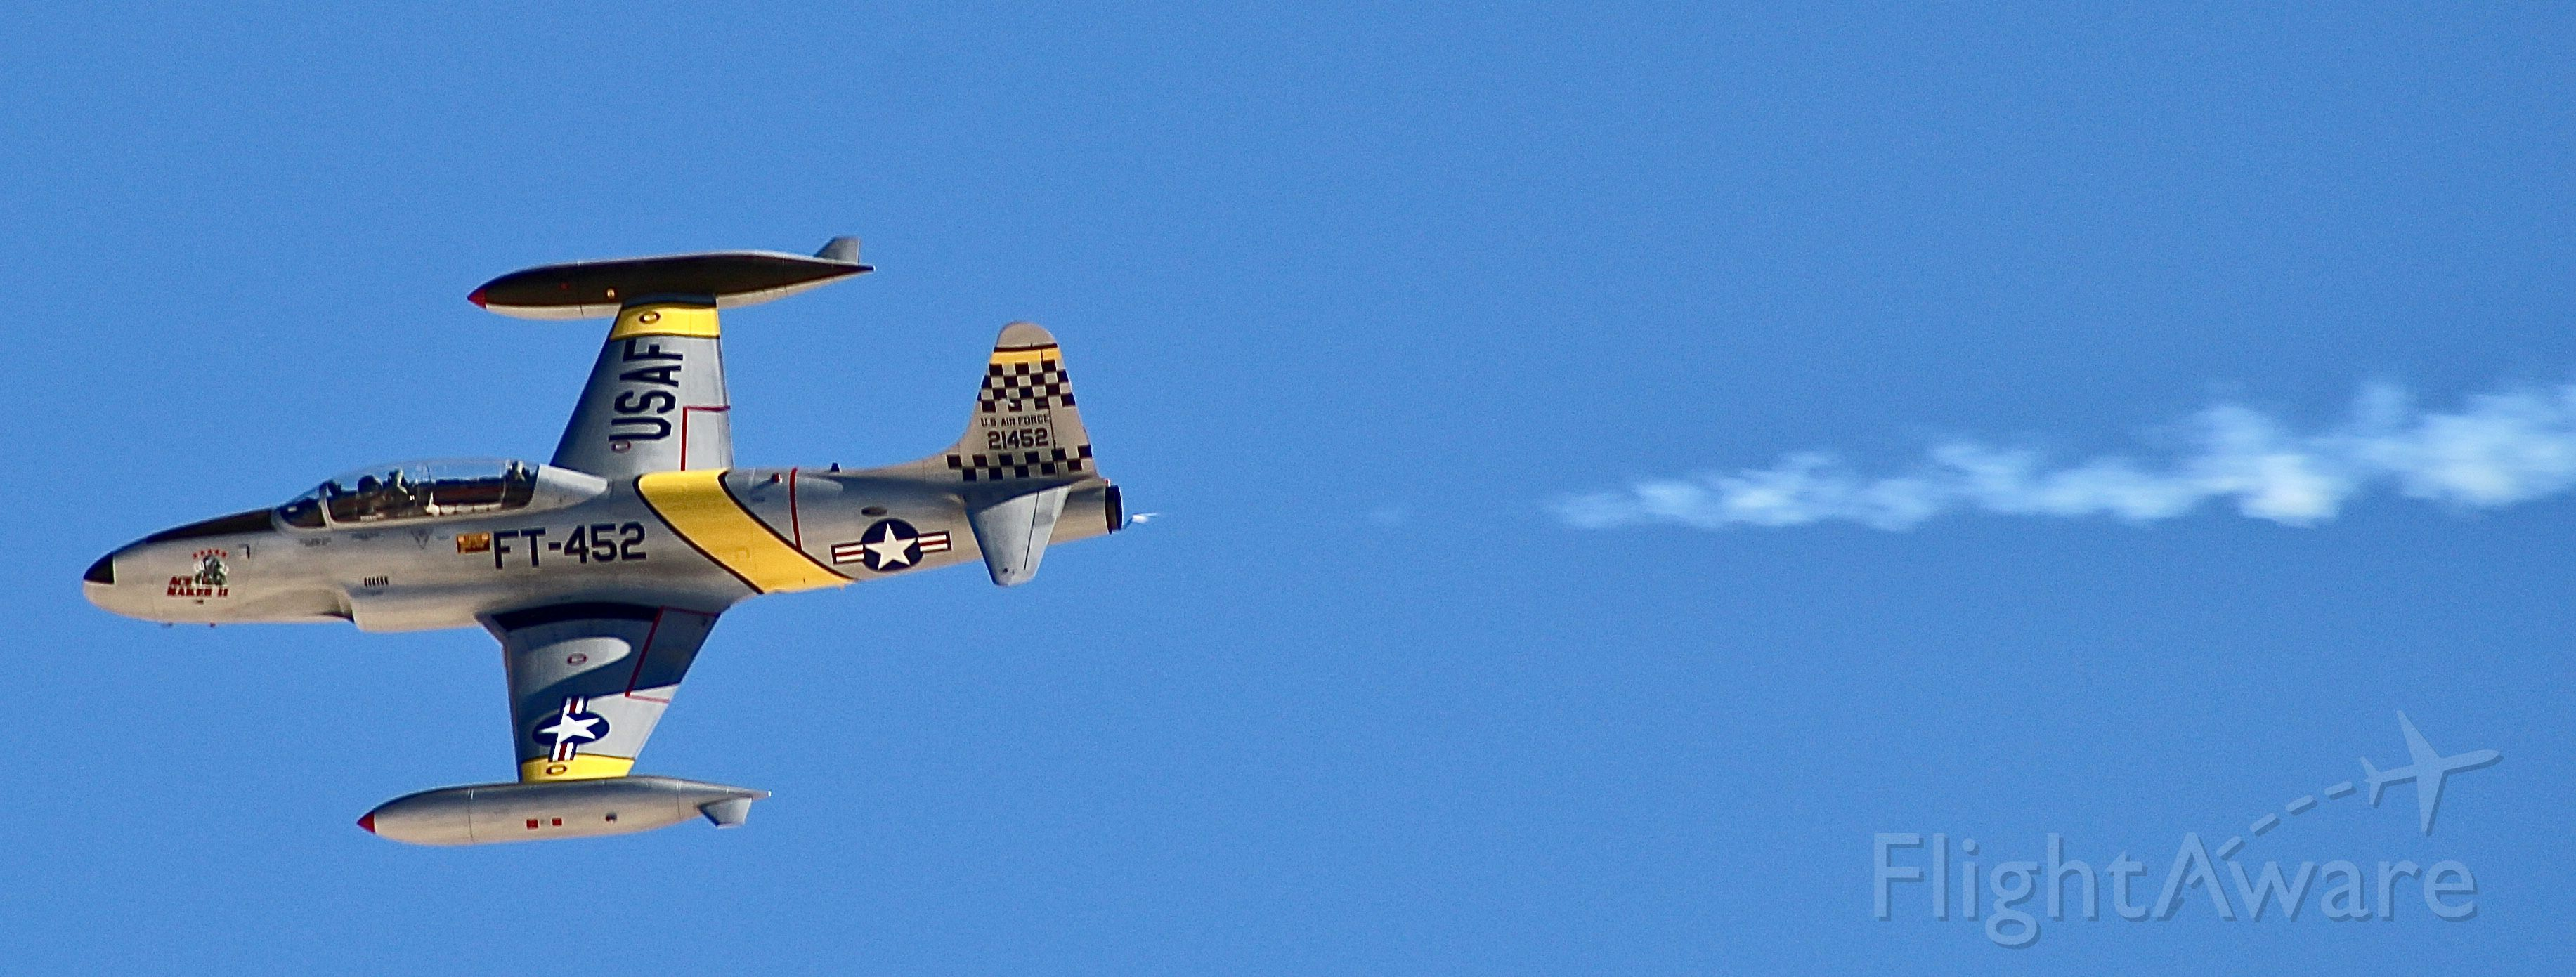 Lockheed T-33 Shooting Star (N21452)